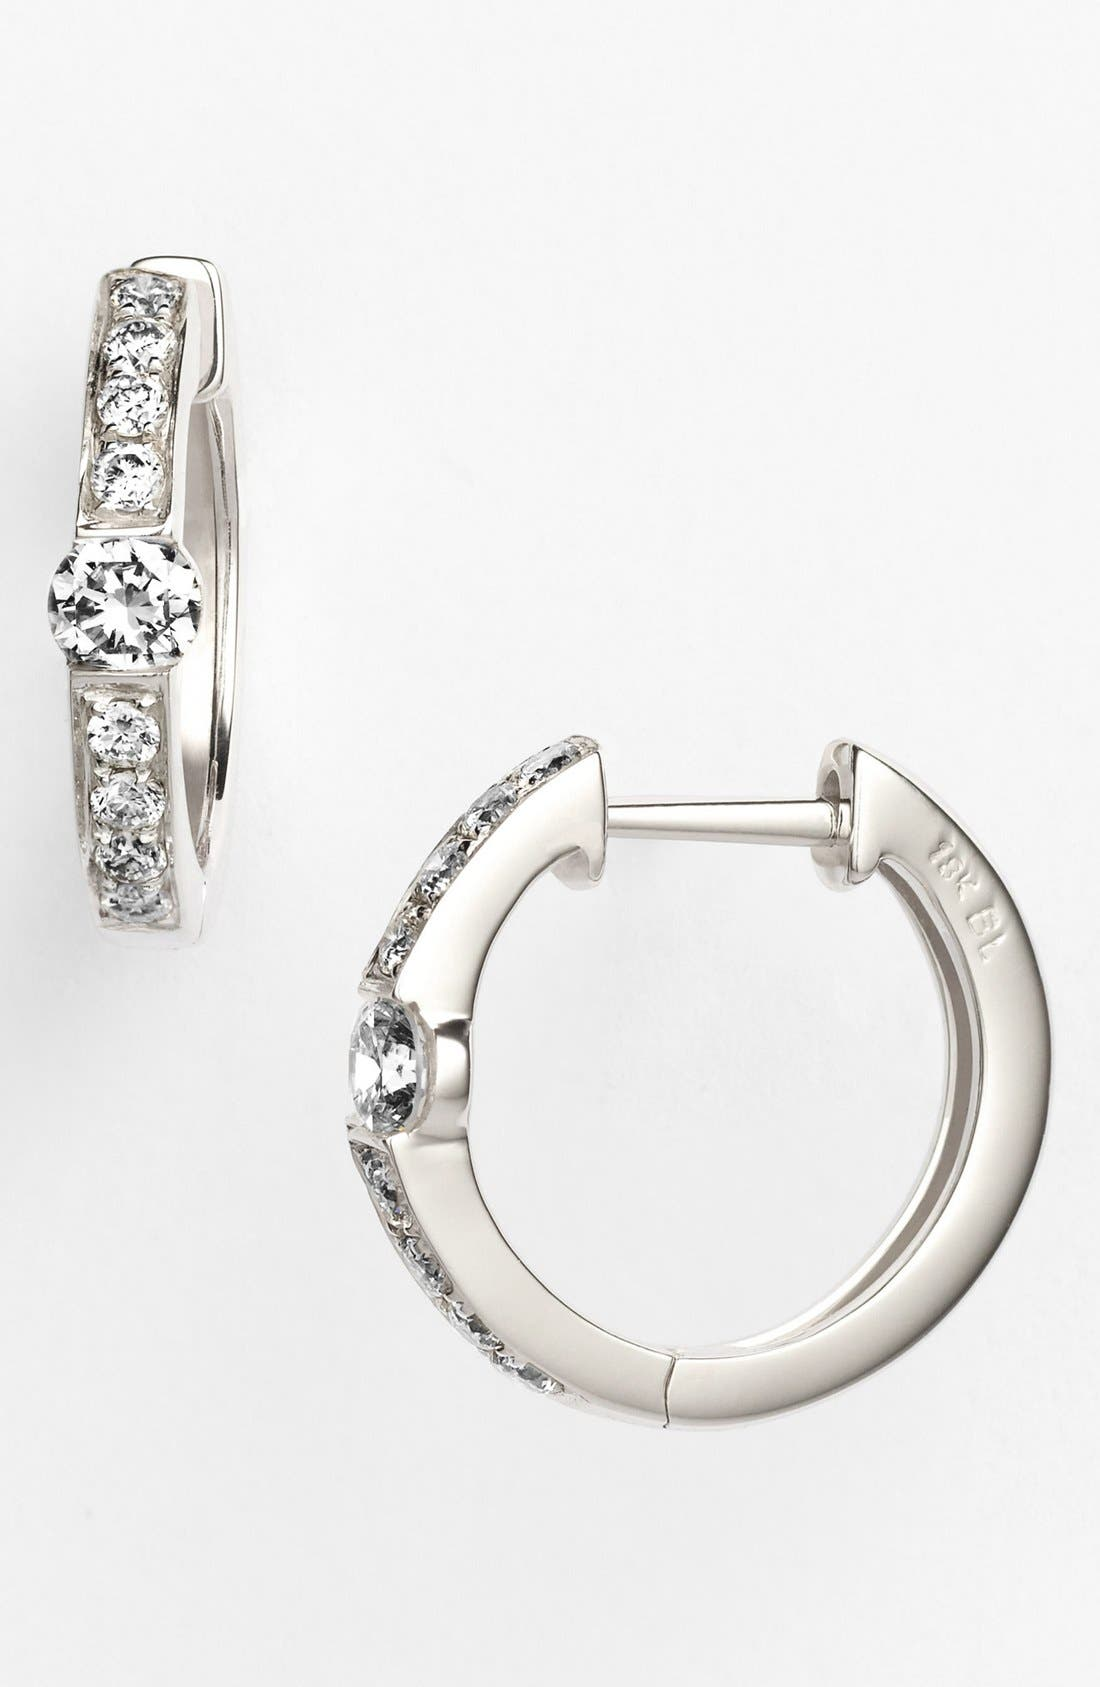 Alternate Image 1 Selected - Bony Levy 'Linea' Small Diamond Hoop Earrings (Nordstrom Exclusive)